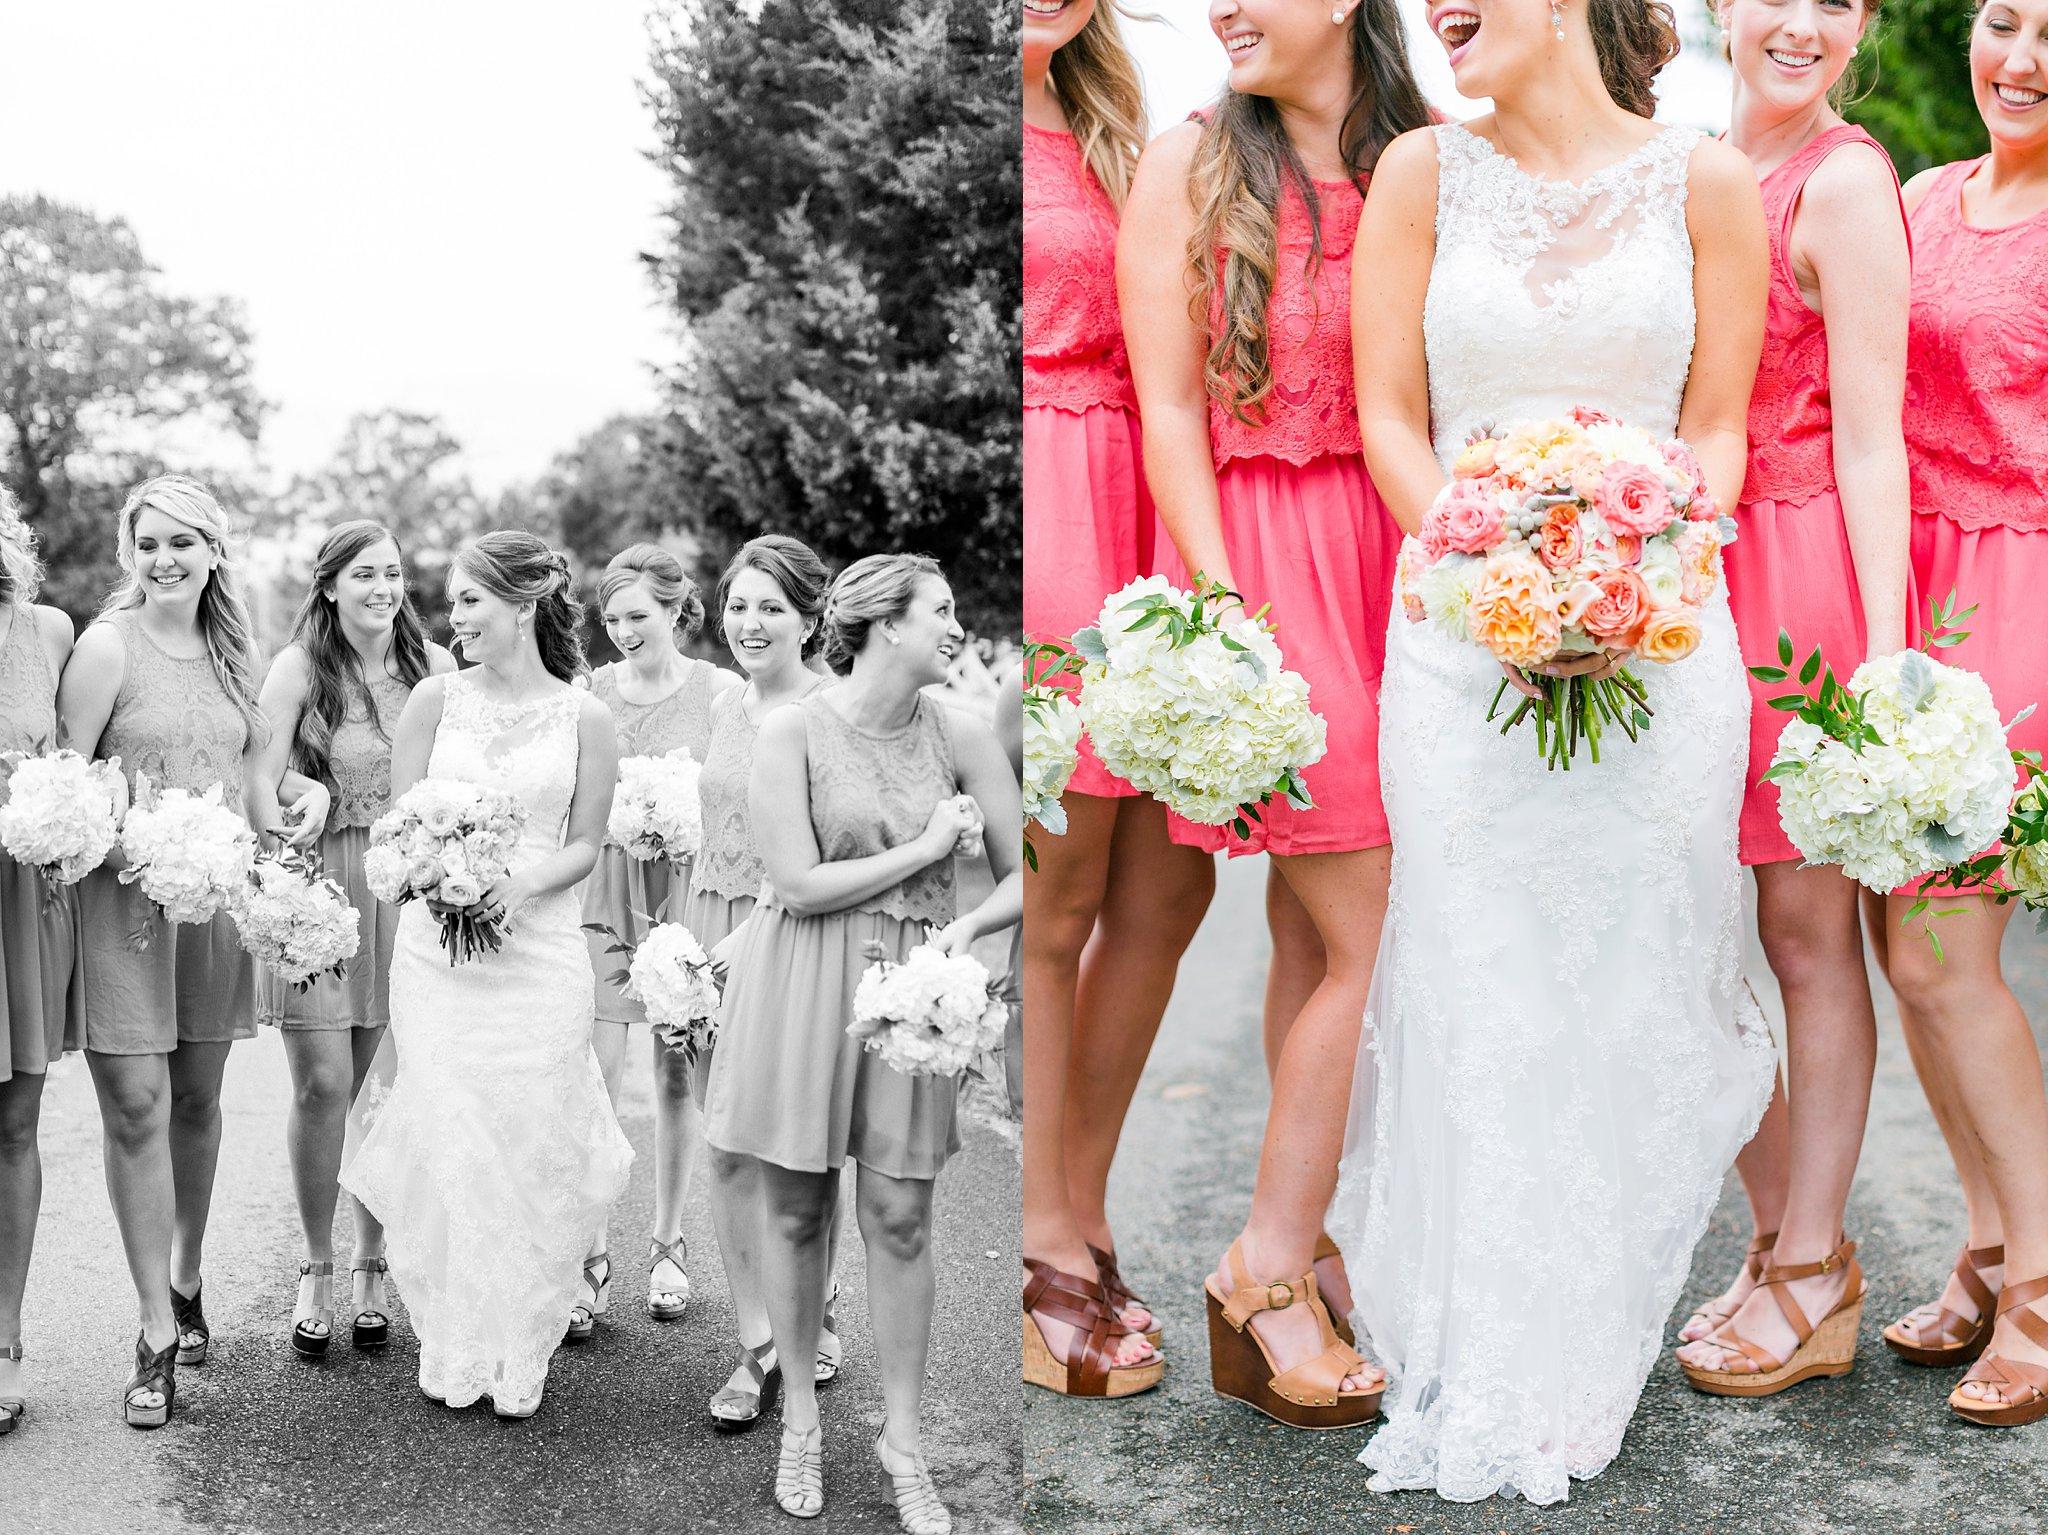 Stone Tower Winery Wedding Photos Virginia Wedding Photographer Megan Kelsey Photography Sam & Angela-71.jpg